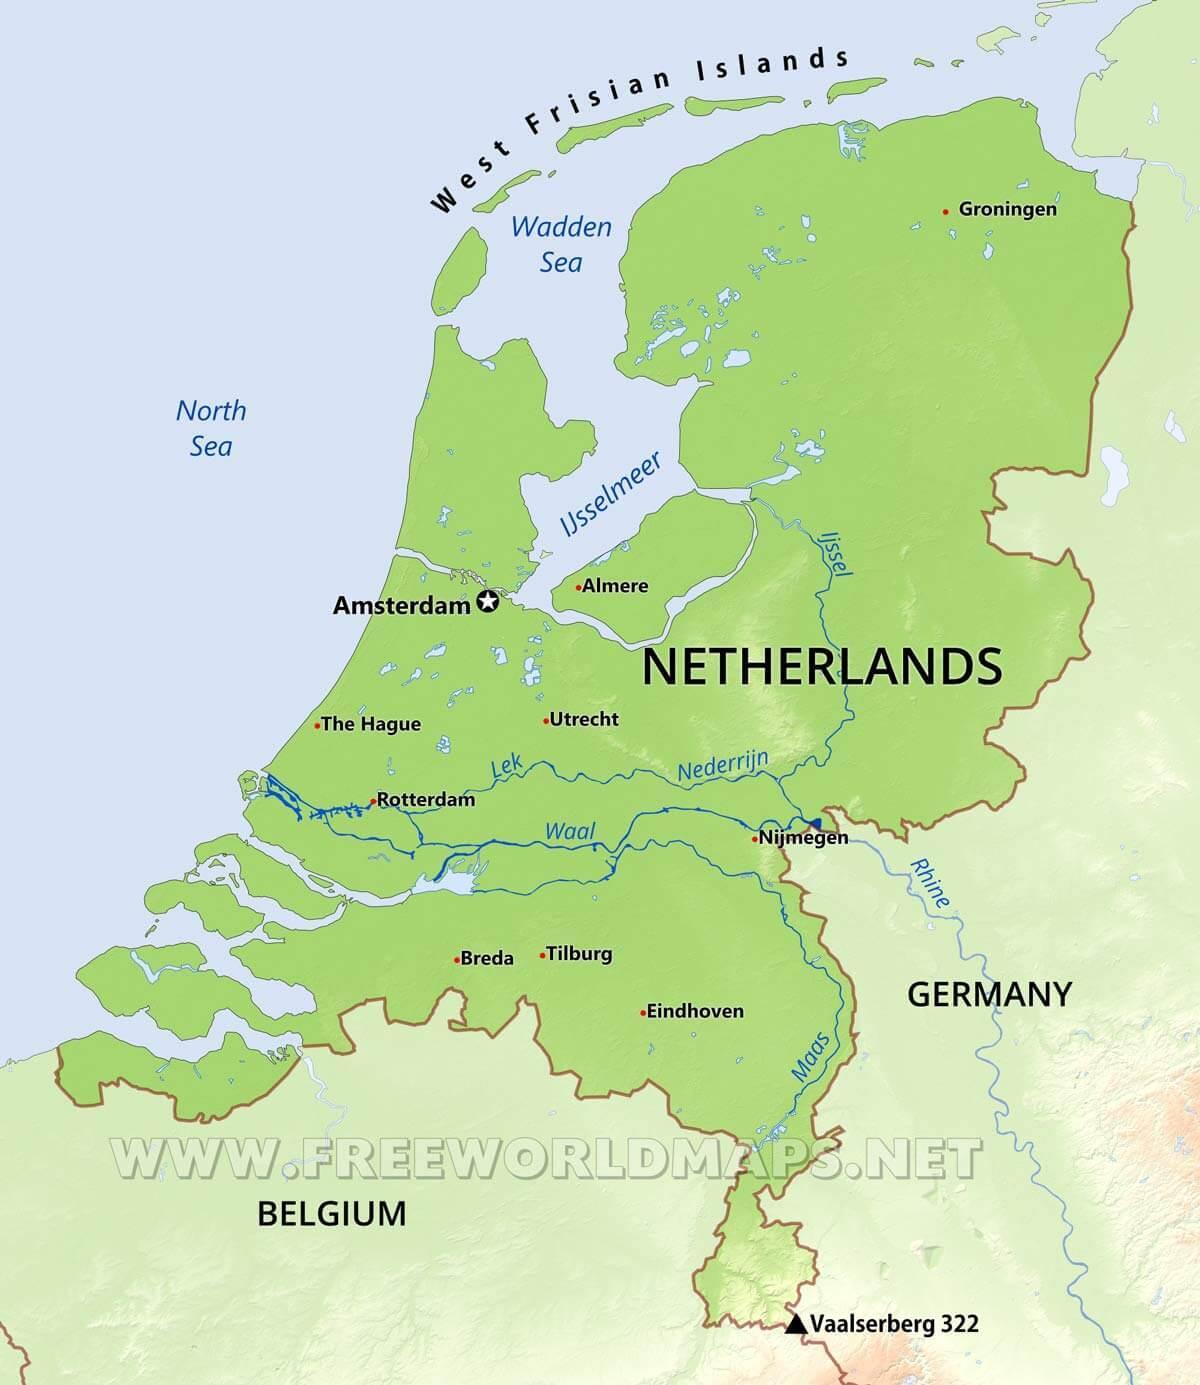 Olanda Cartina Fisica.Paesi Bassi Mappa Fisica Fisica Mappa Dei Paesi Bassi Europa Occidentale Europa